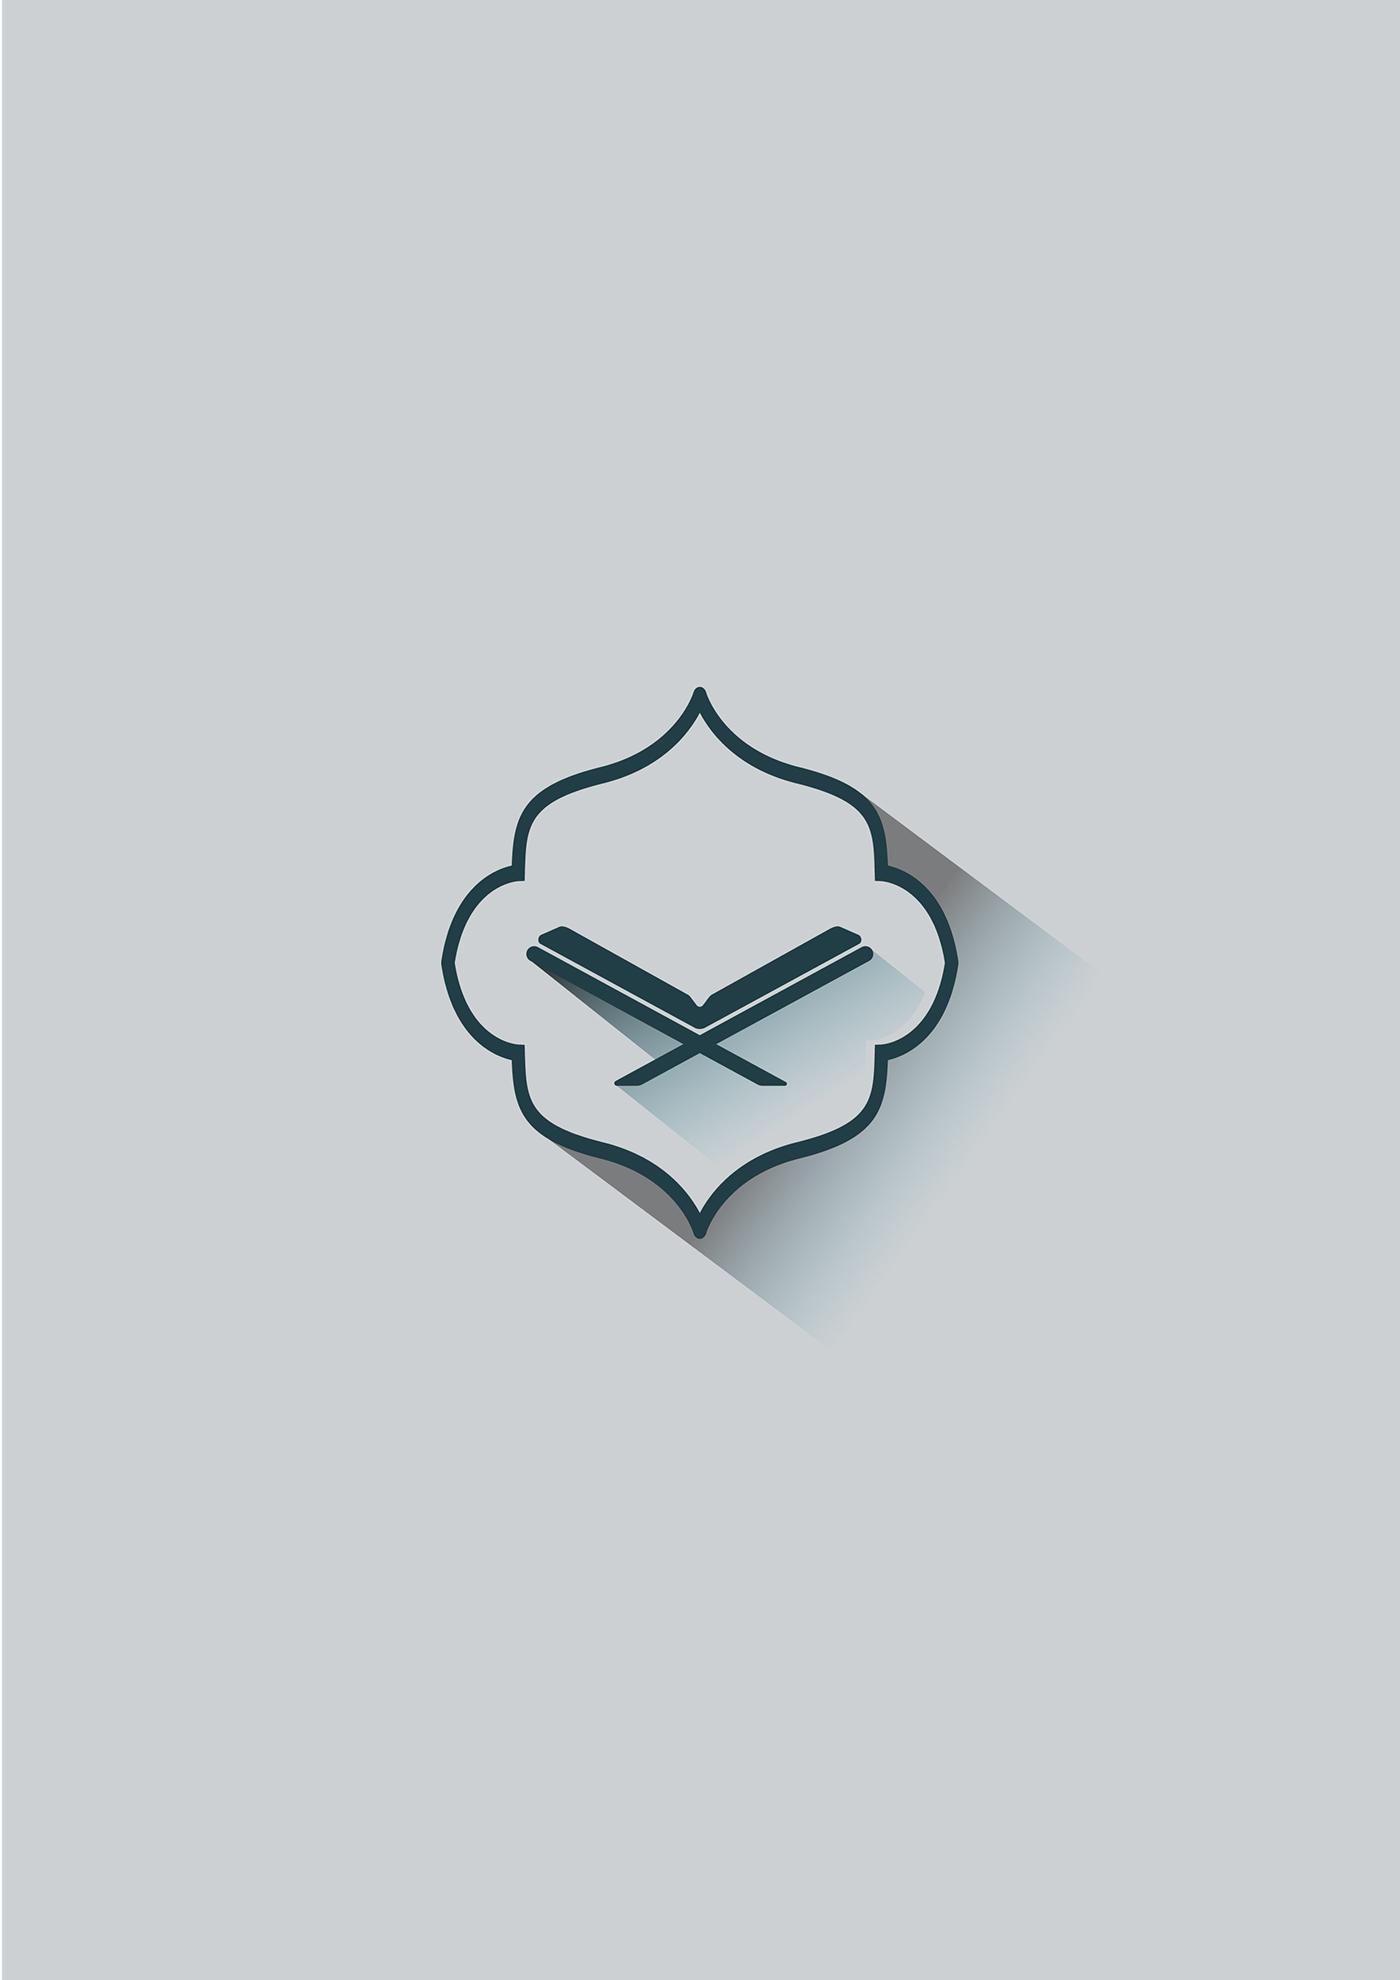 Quran Qur'an vector muslim islam Ramdhan cover blue flat